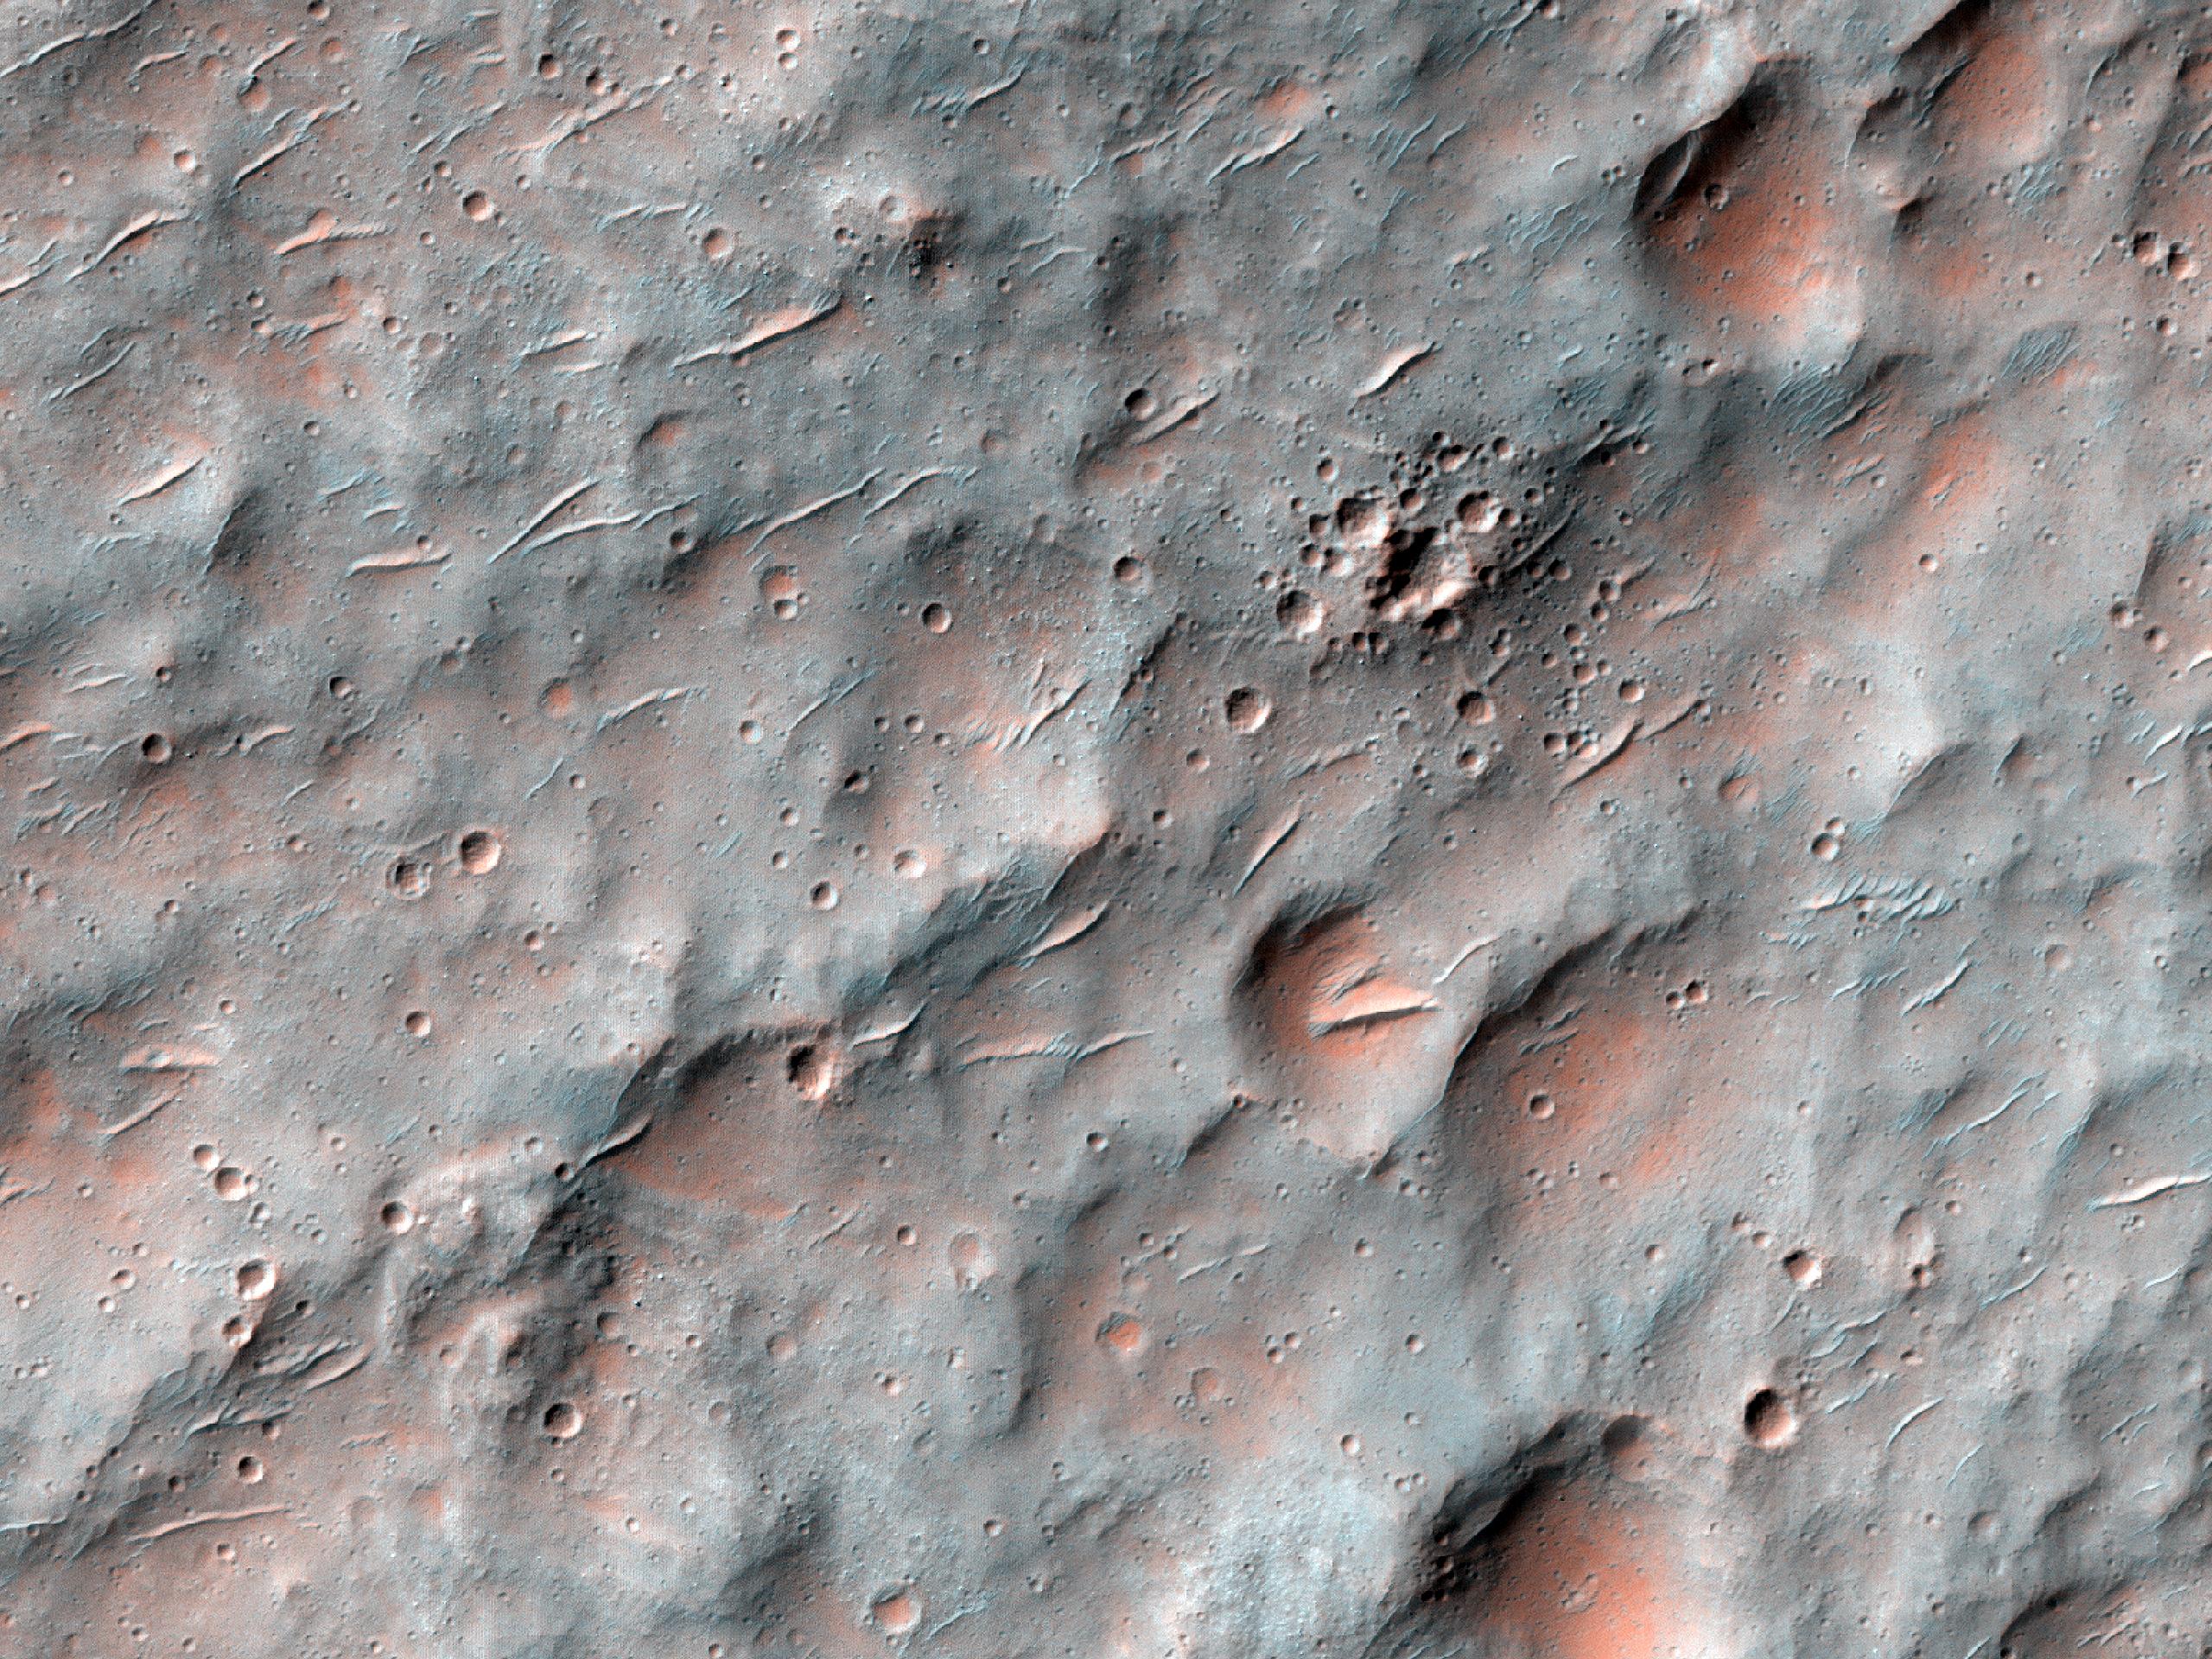 Possible Clay-Rich Terrain in Sedimentary Plain